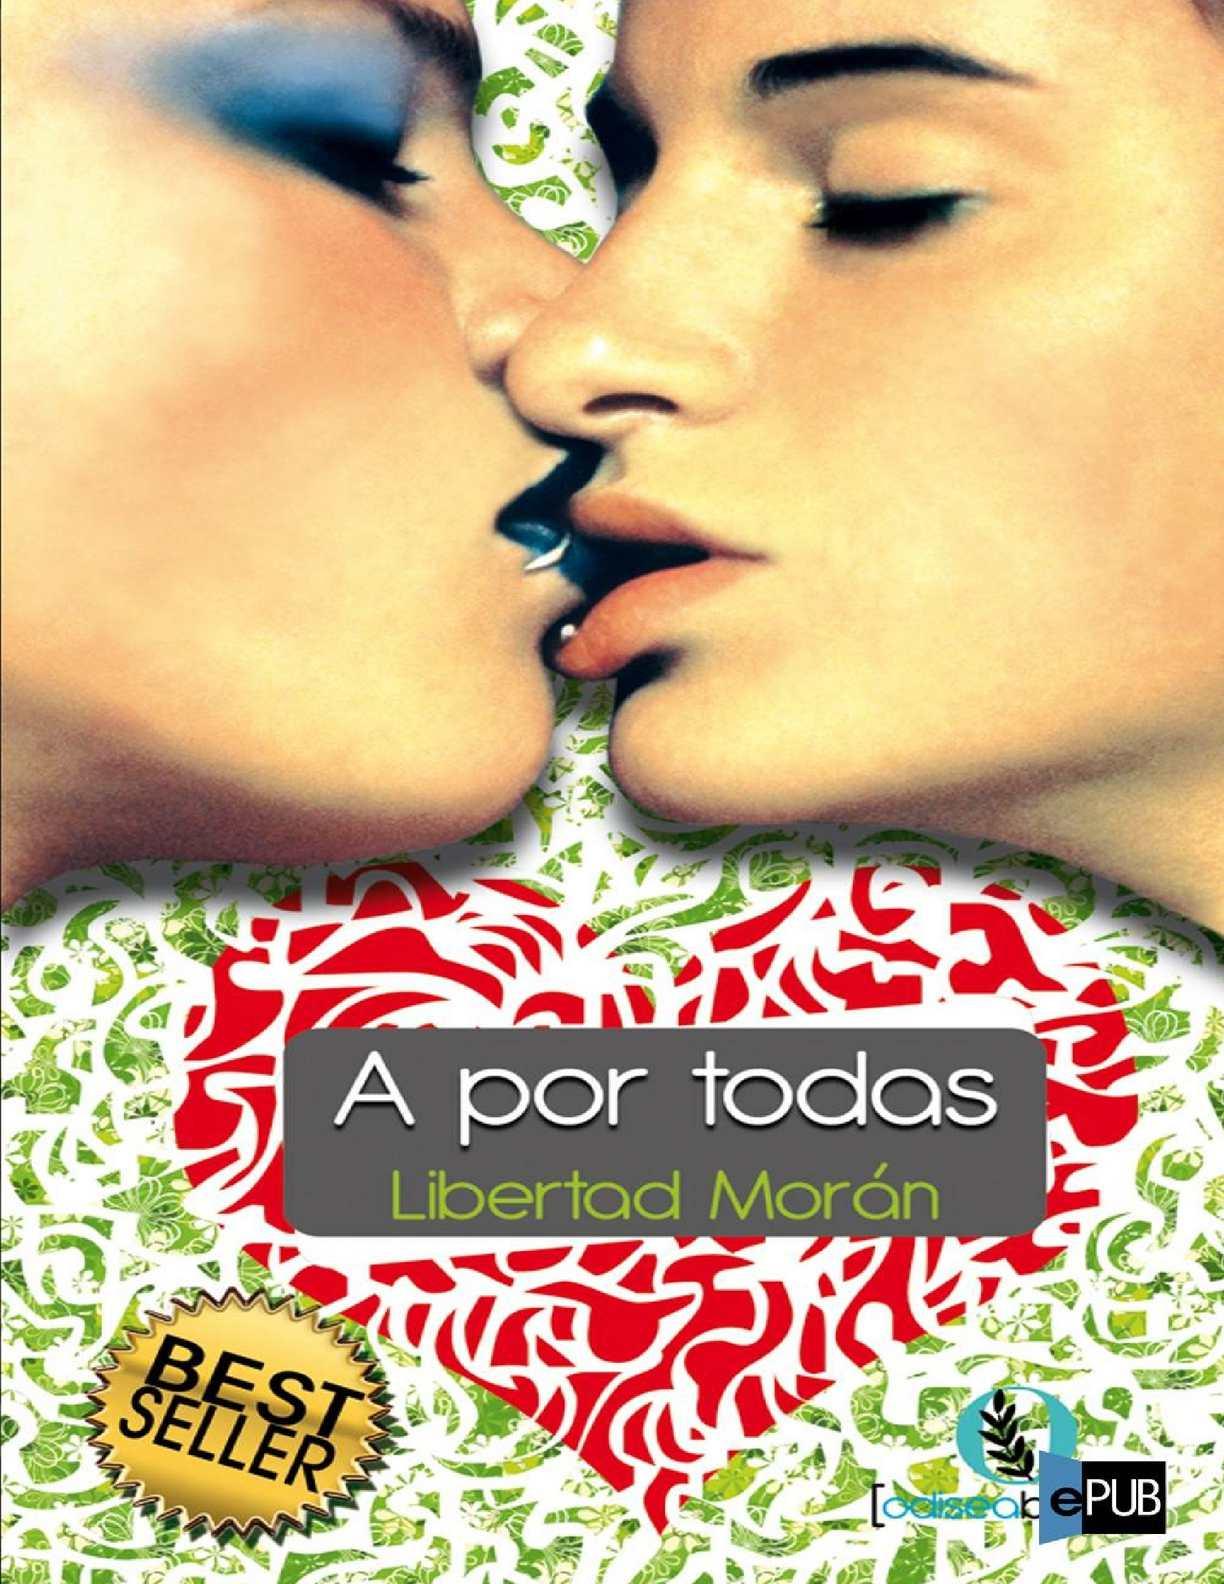 Chat gay gratis escort vip santiago chile